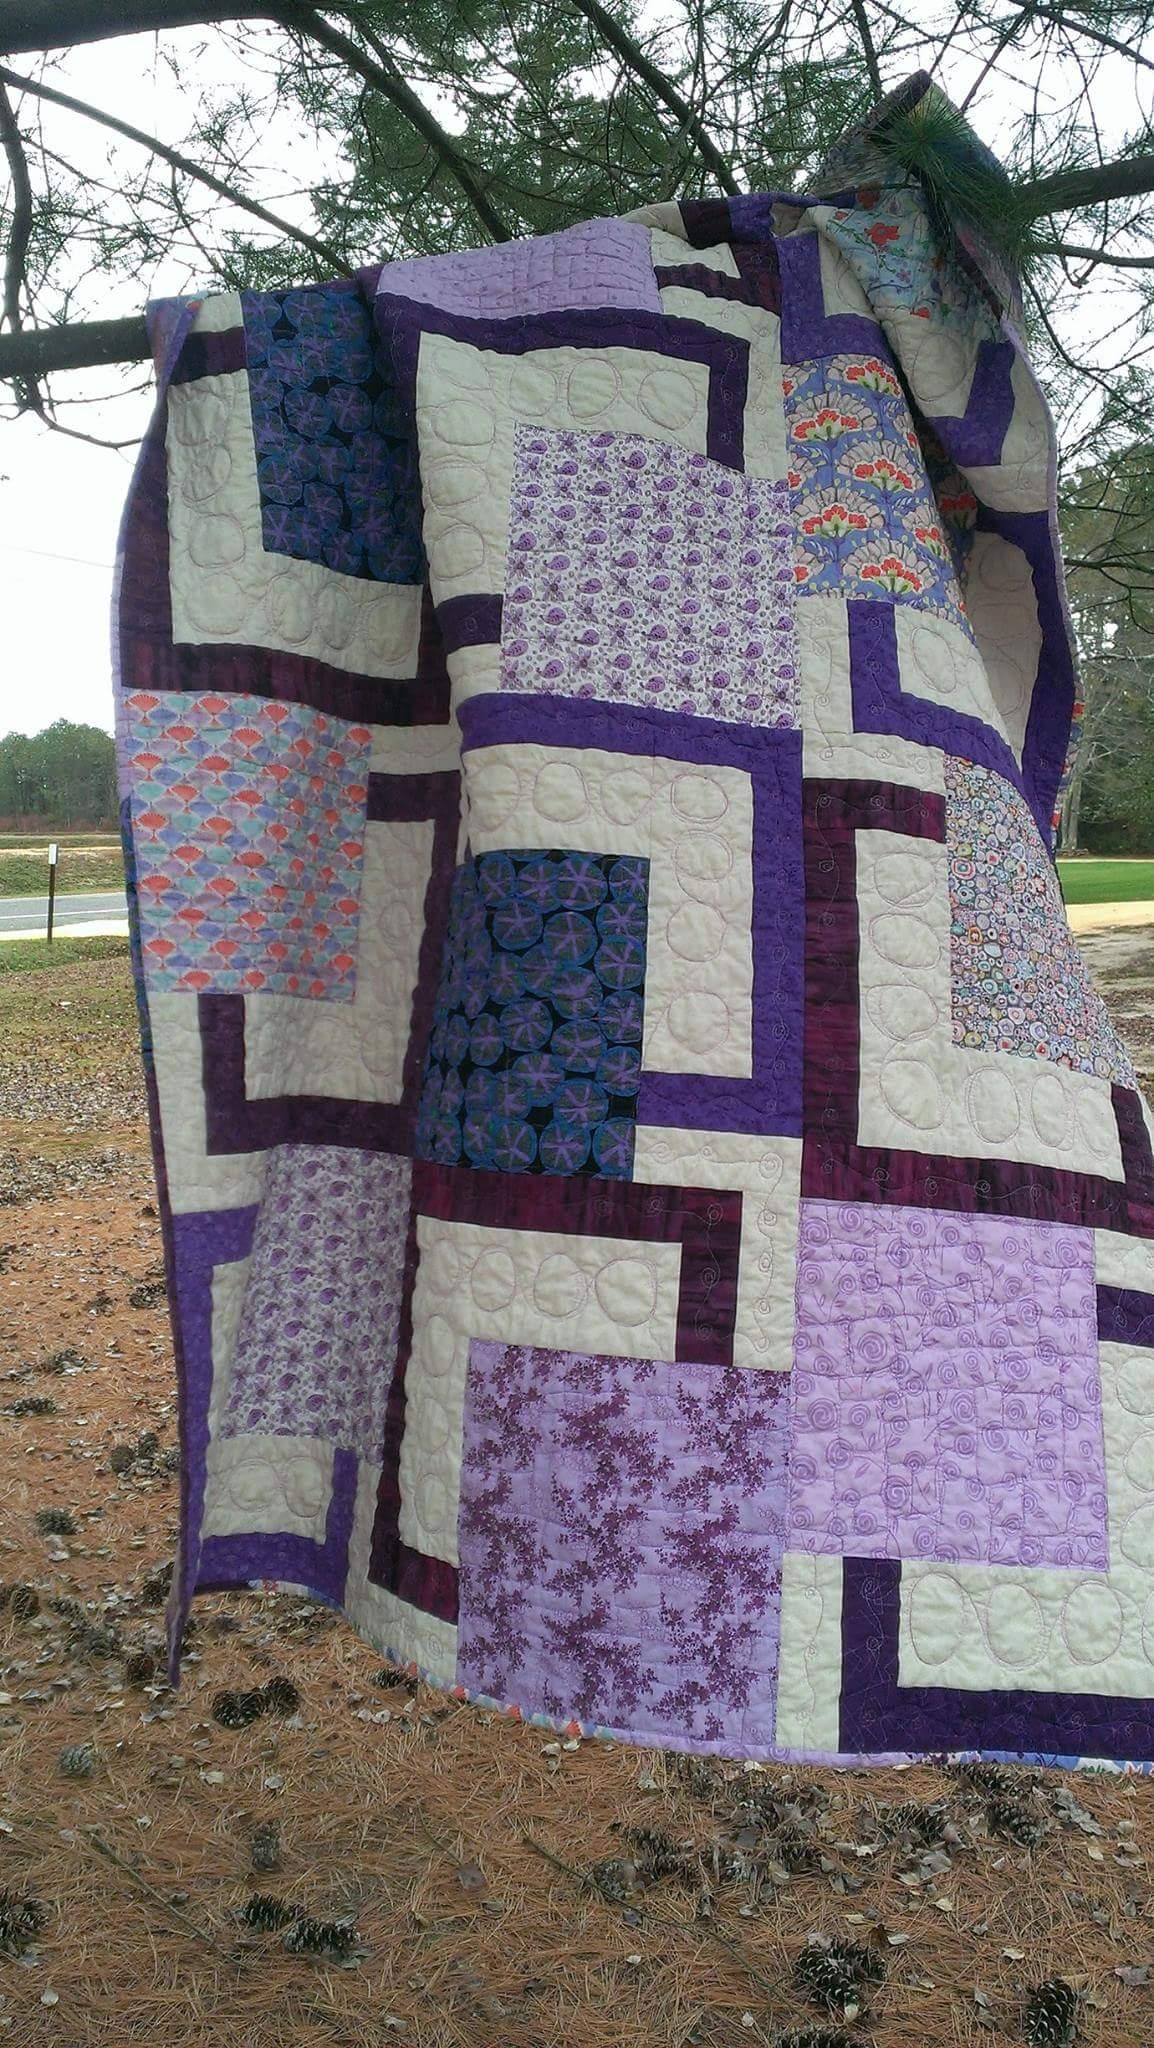 scrappy purple squares on a cream background